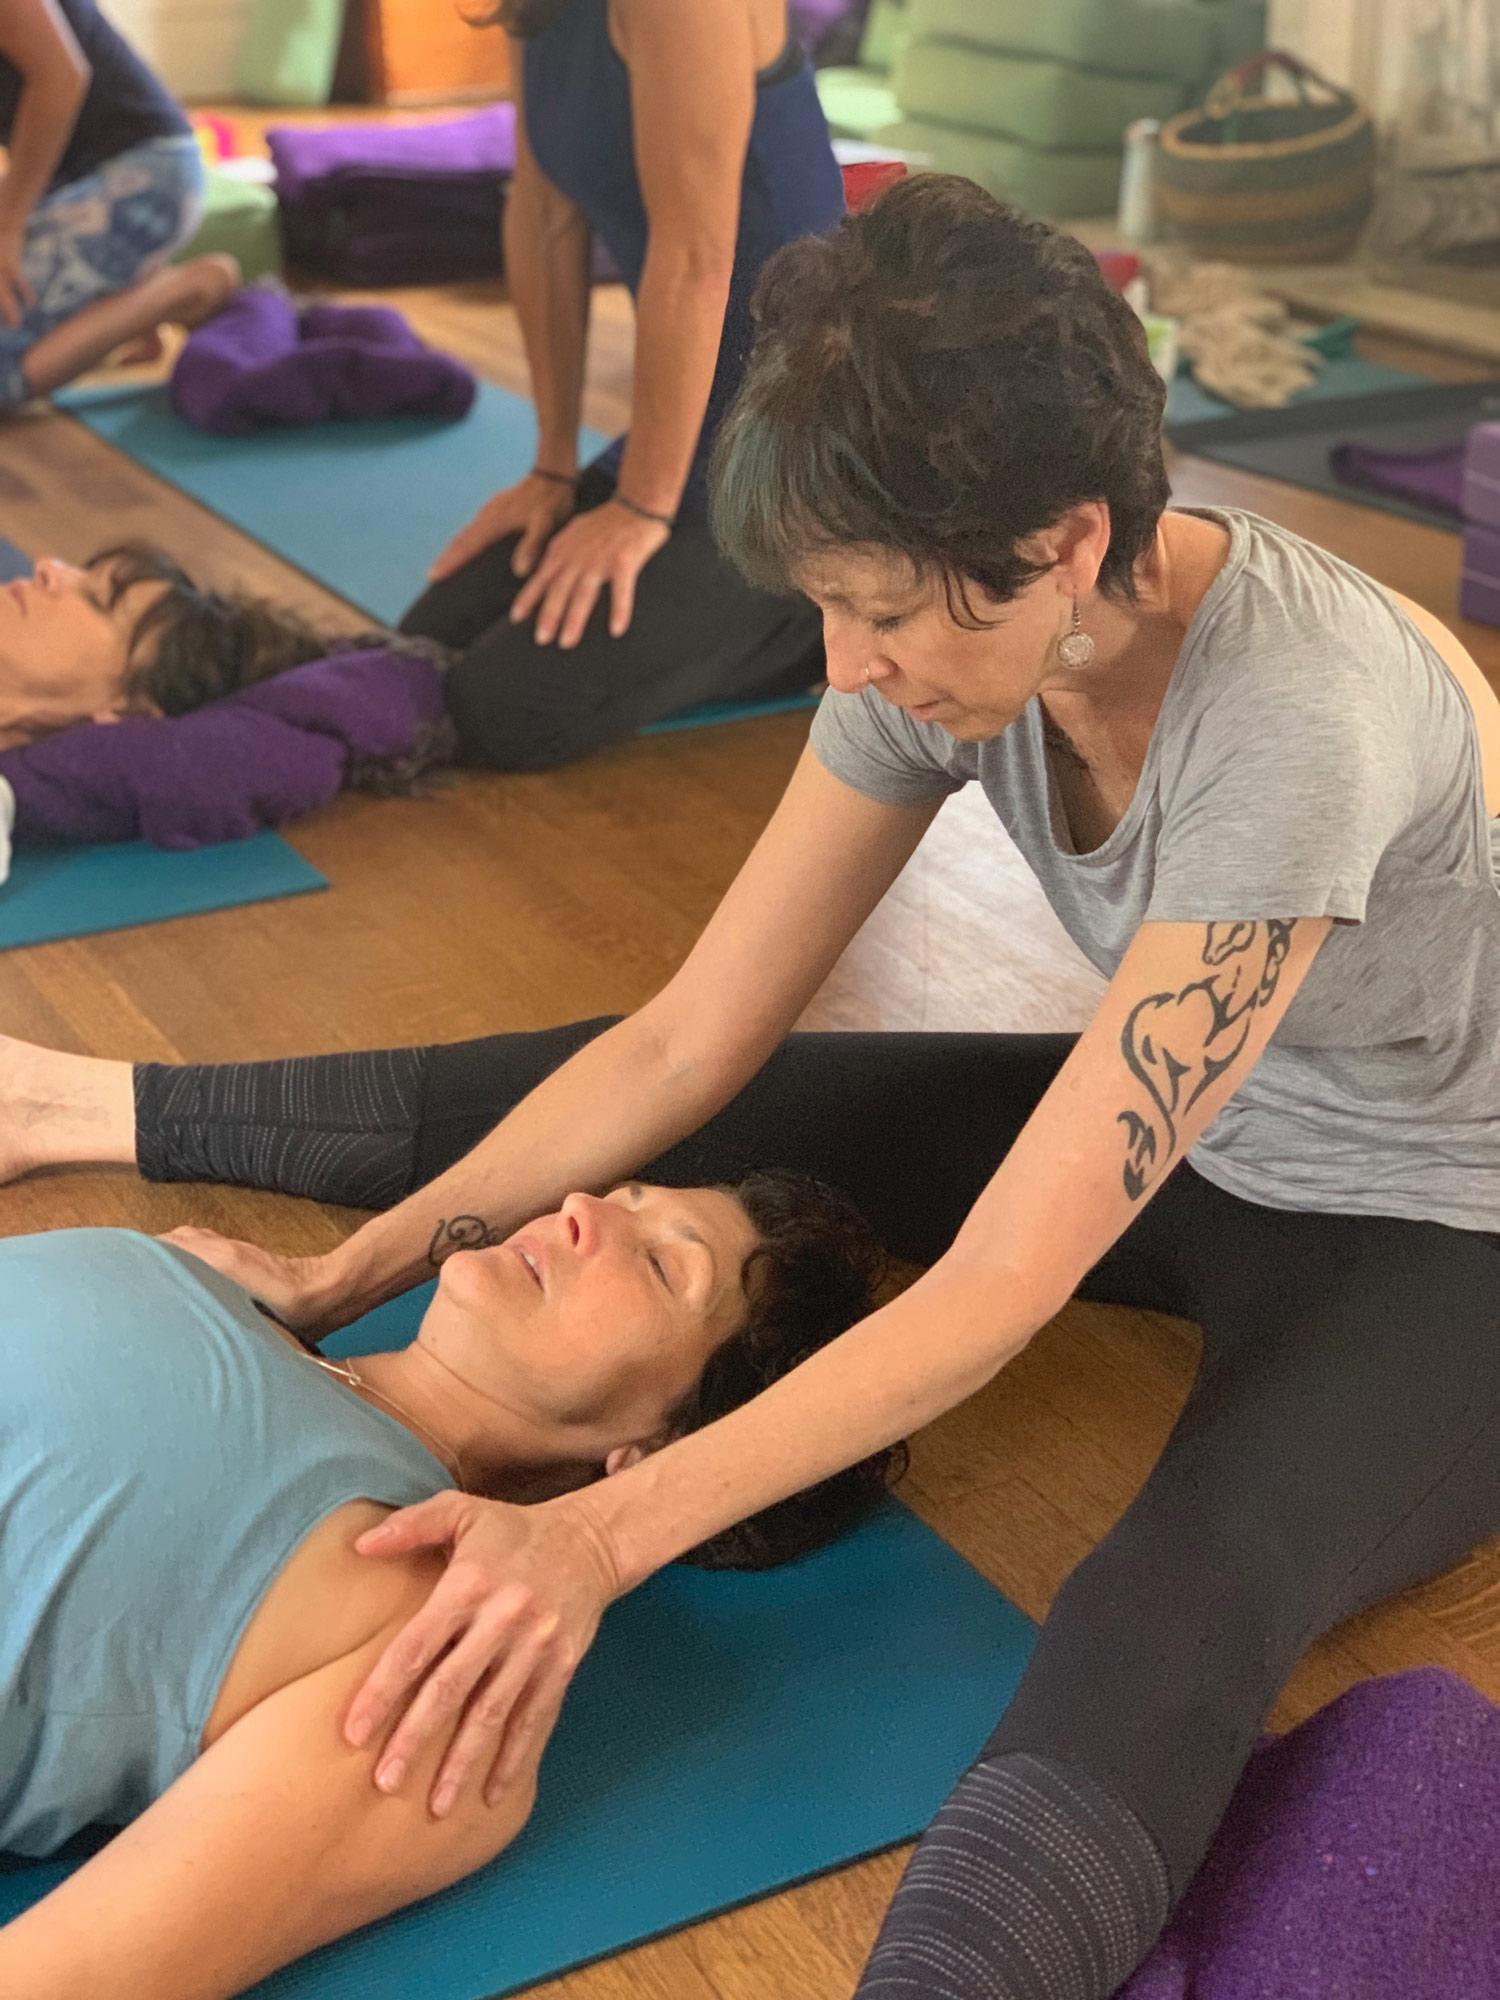 durga-excursions-yin-yoga-teacher-training-manitou-colorado-4.jpg